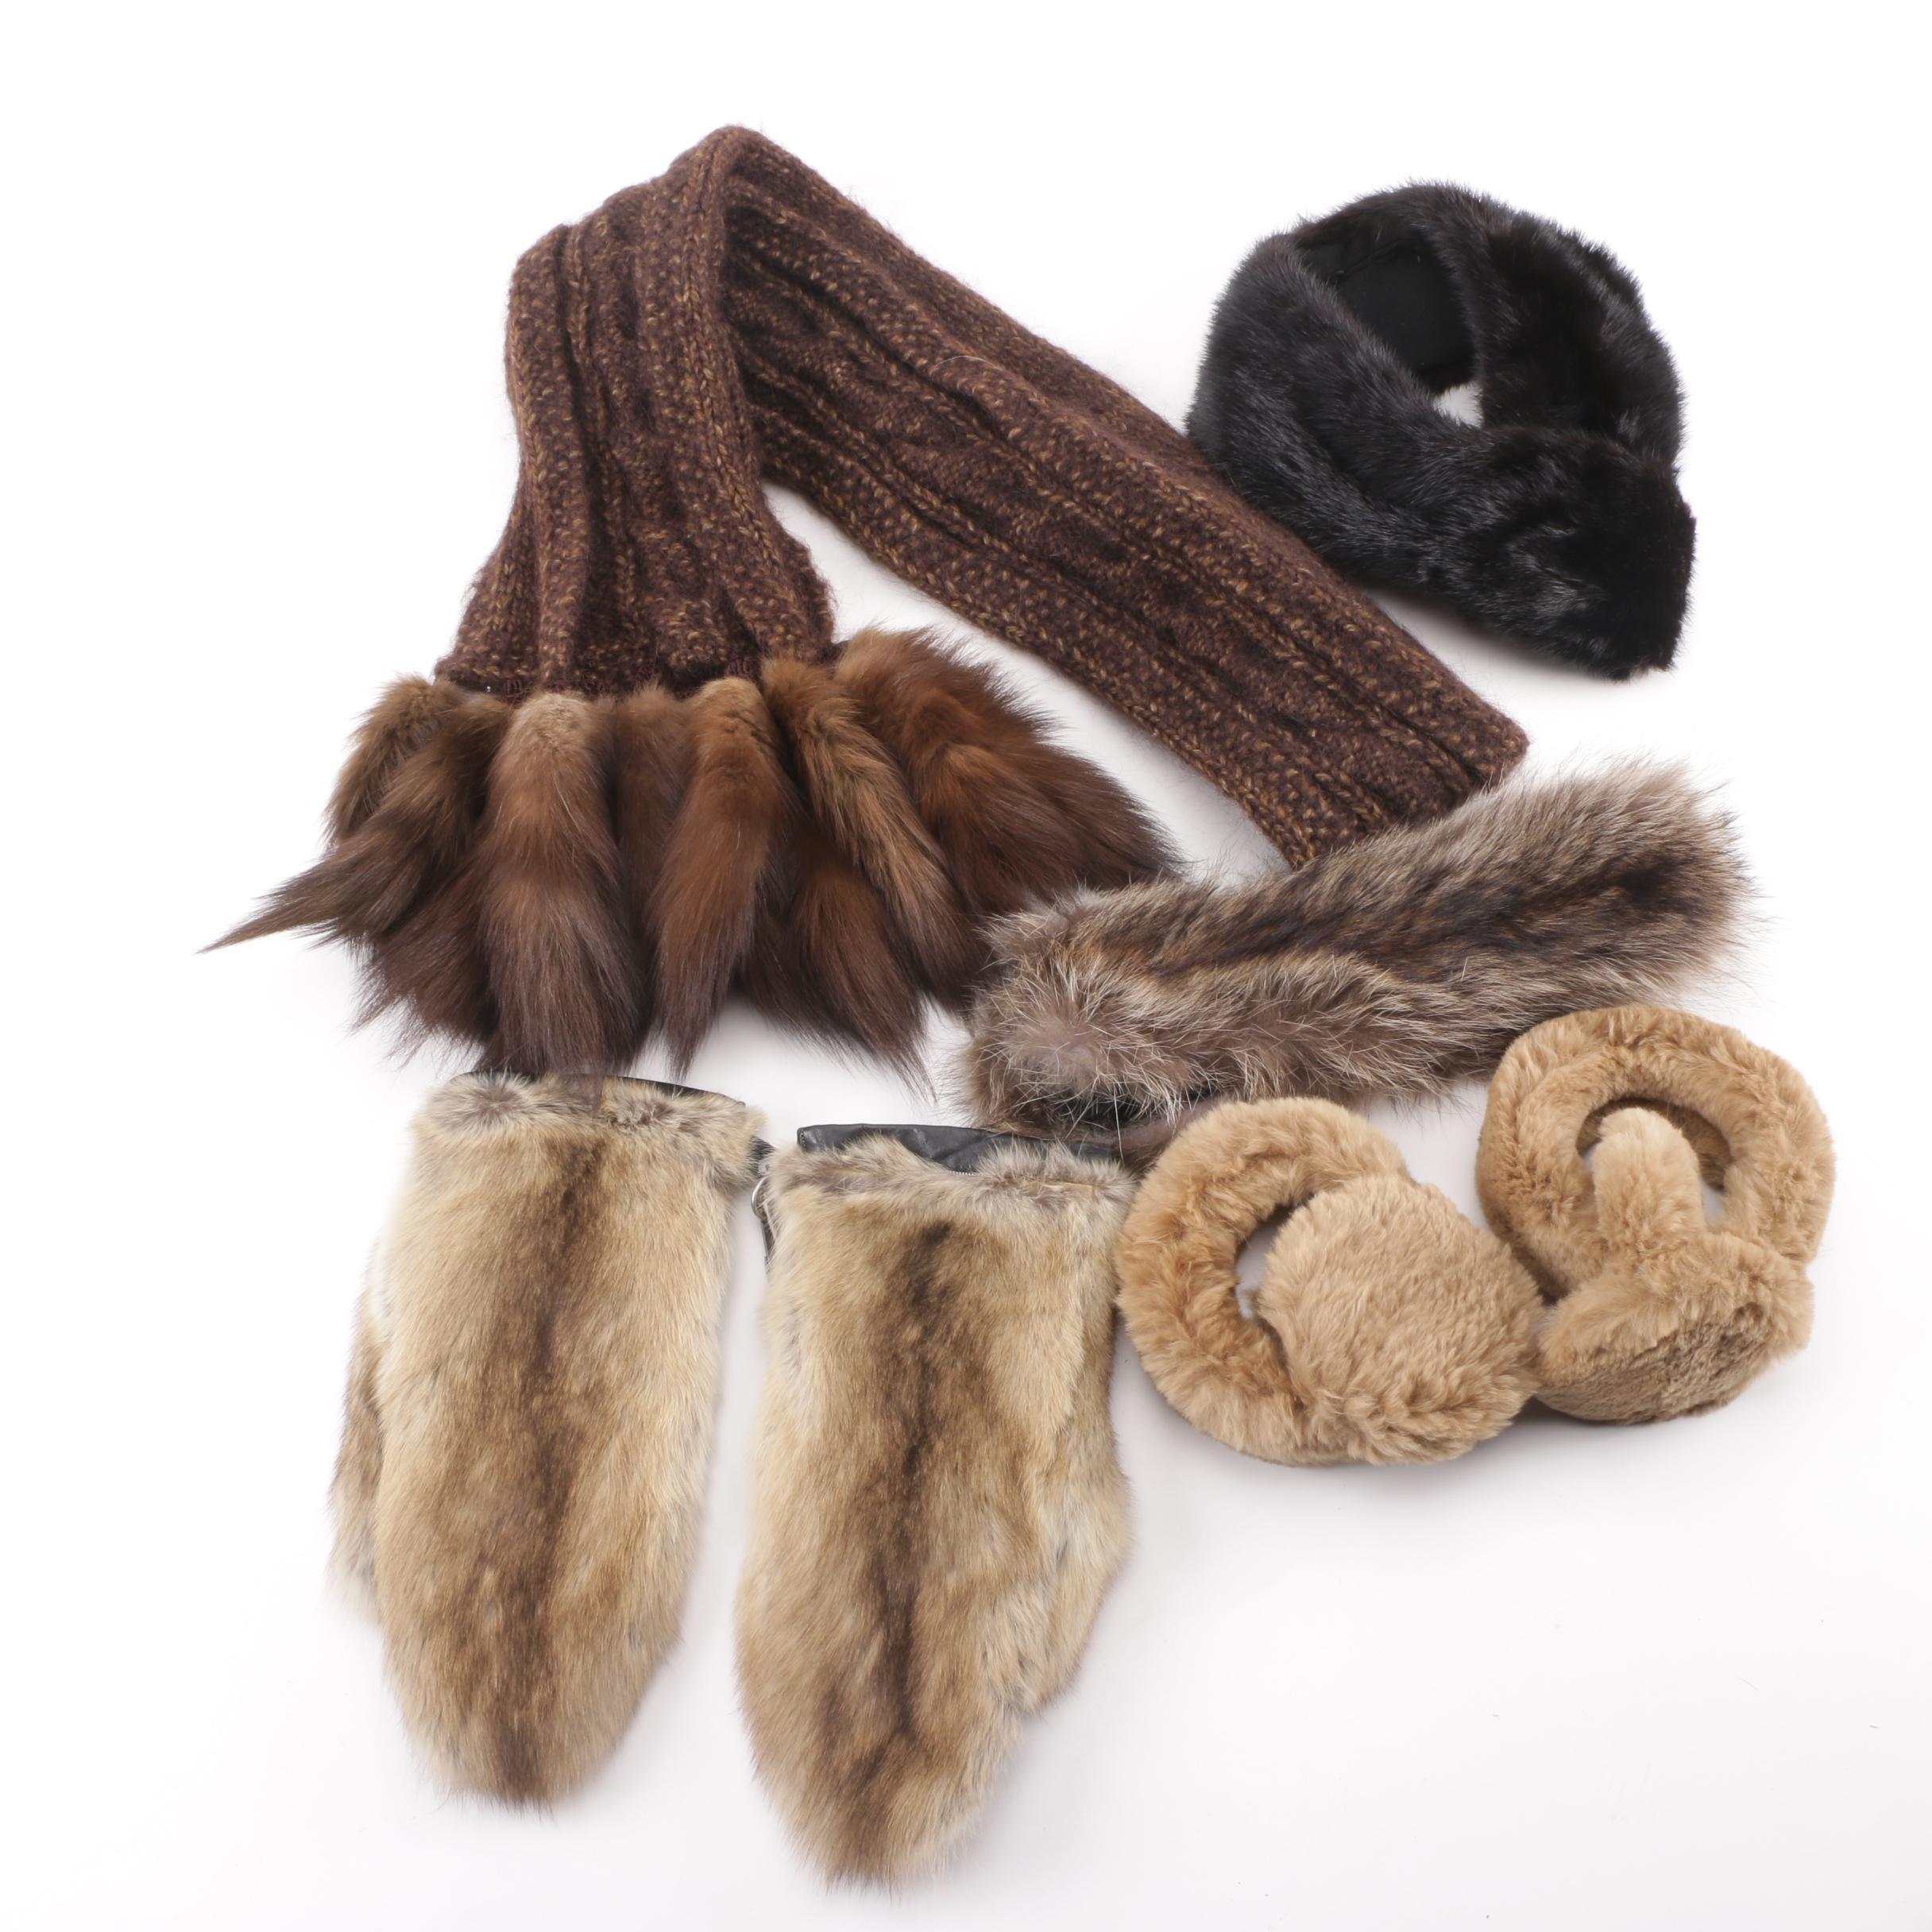 Mink Fur Tail Scarf with Fur Headband, Earmuffs, Gloves and Collar